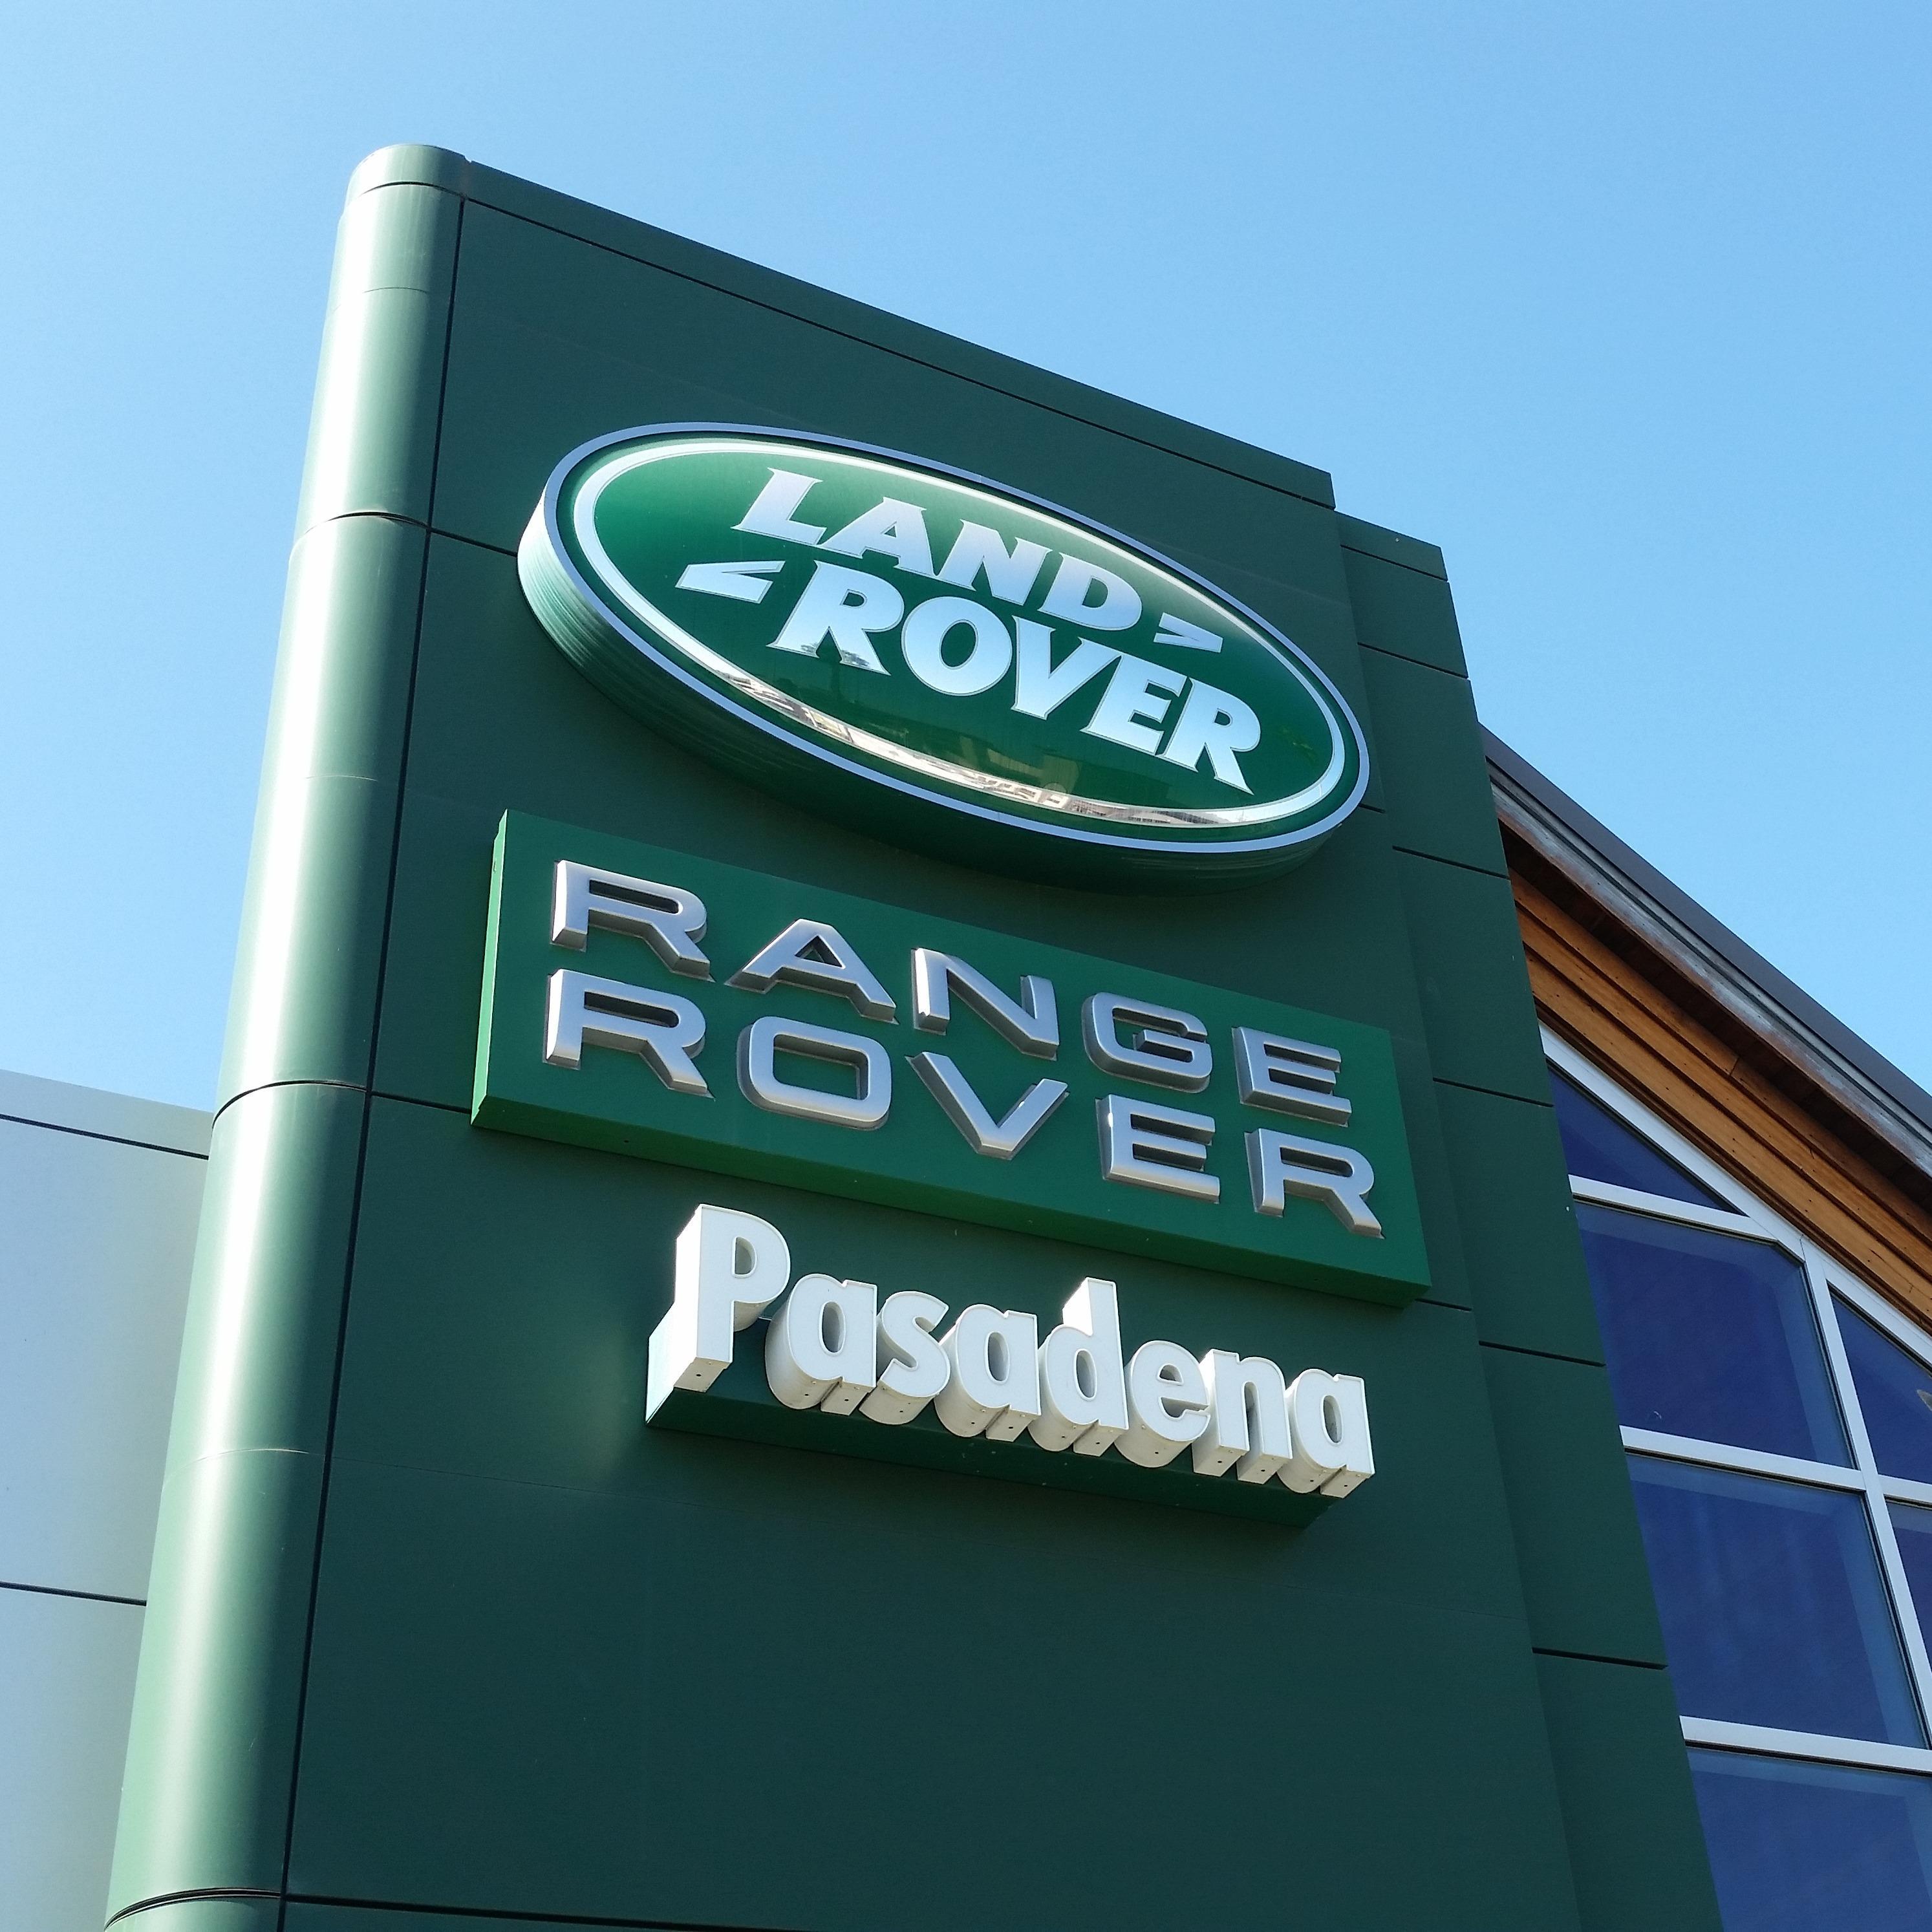 Land Rover Pasadena in Pasadena CA 626 795 2